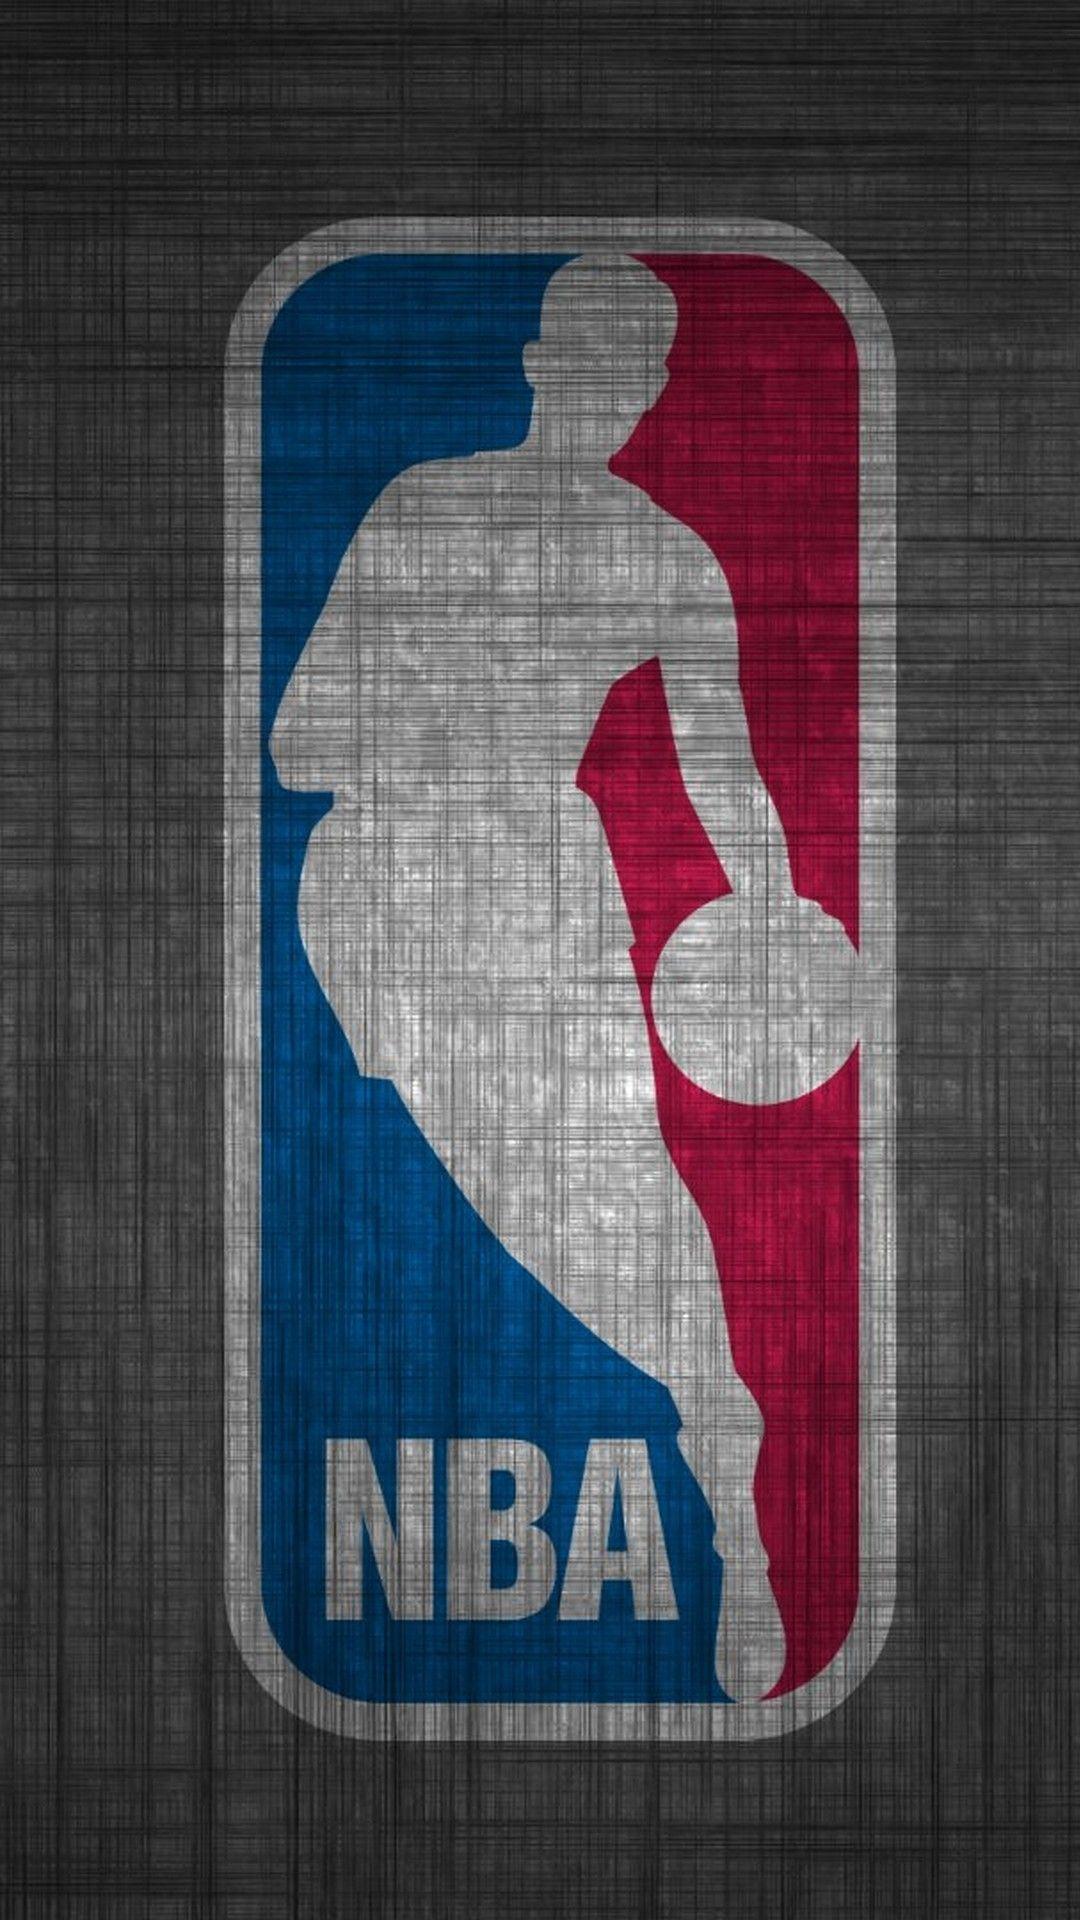 NBA Wallpaper Mobile Nba wallpapers Basketball background 1080x1920